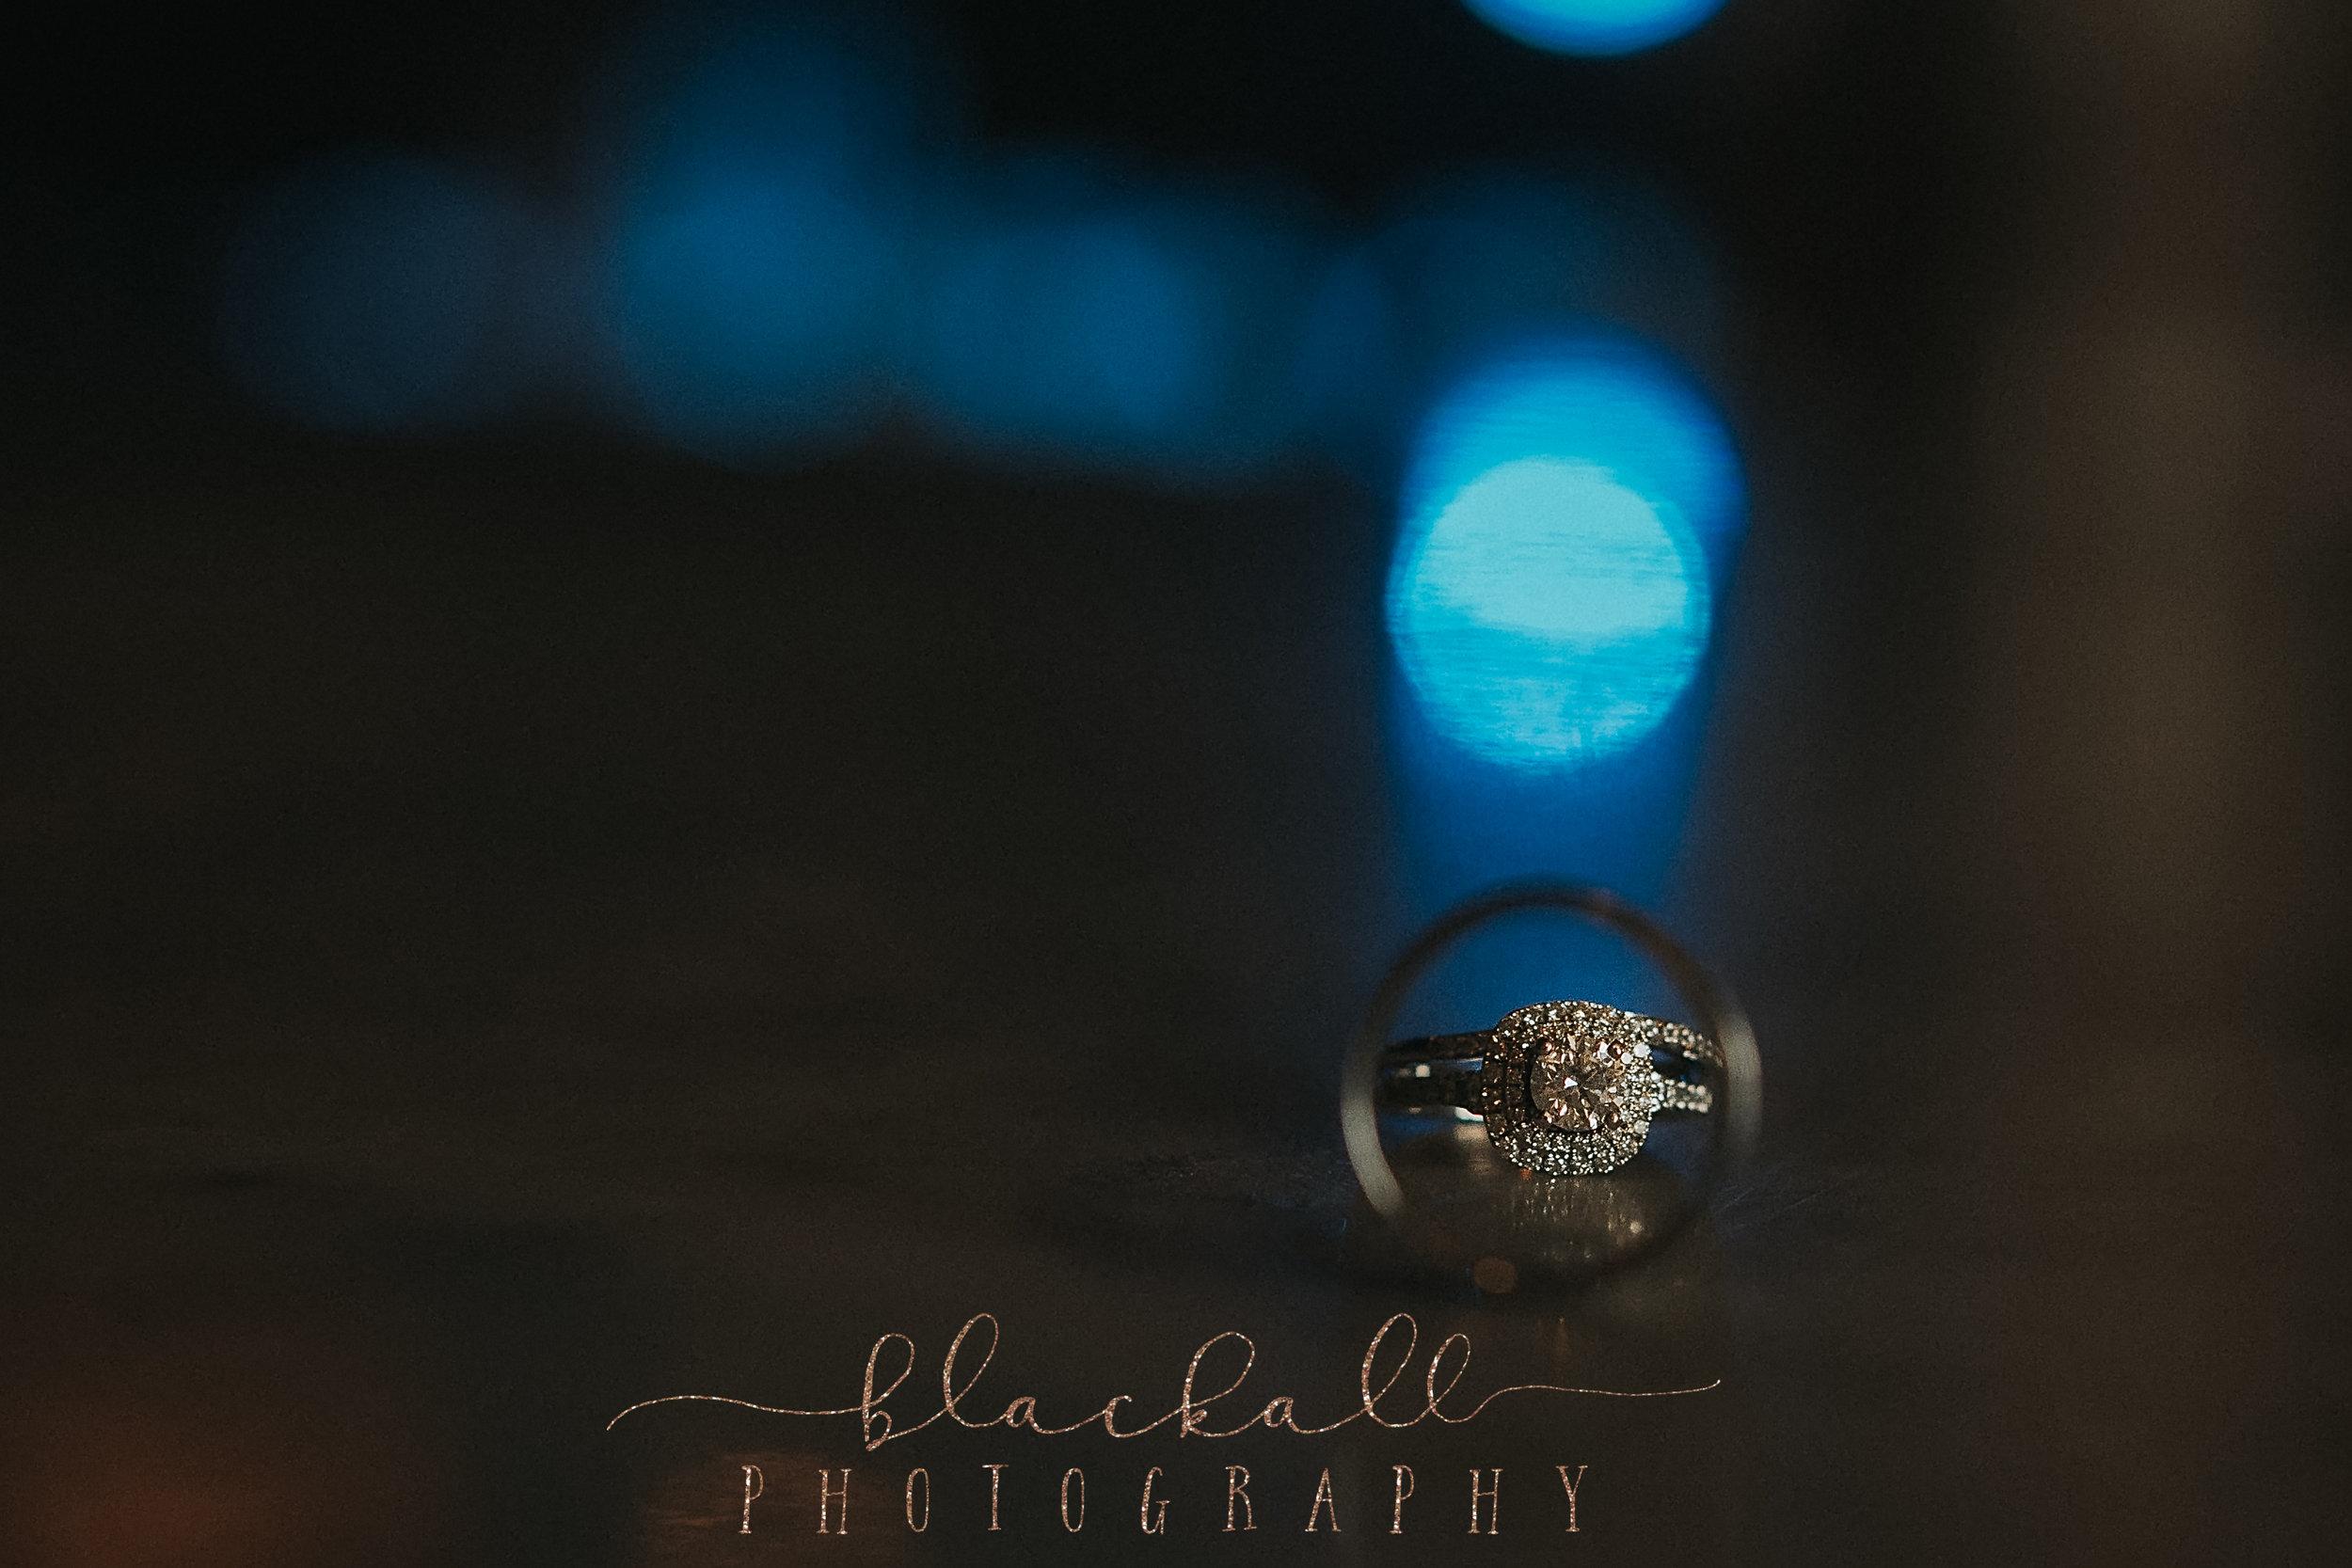 _BlackallPhotography_1.JPG